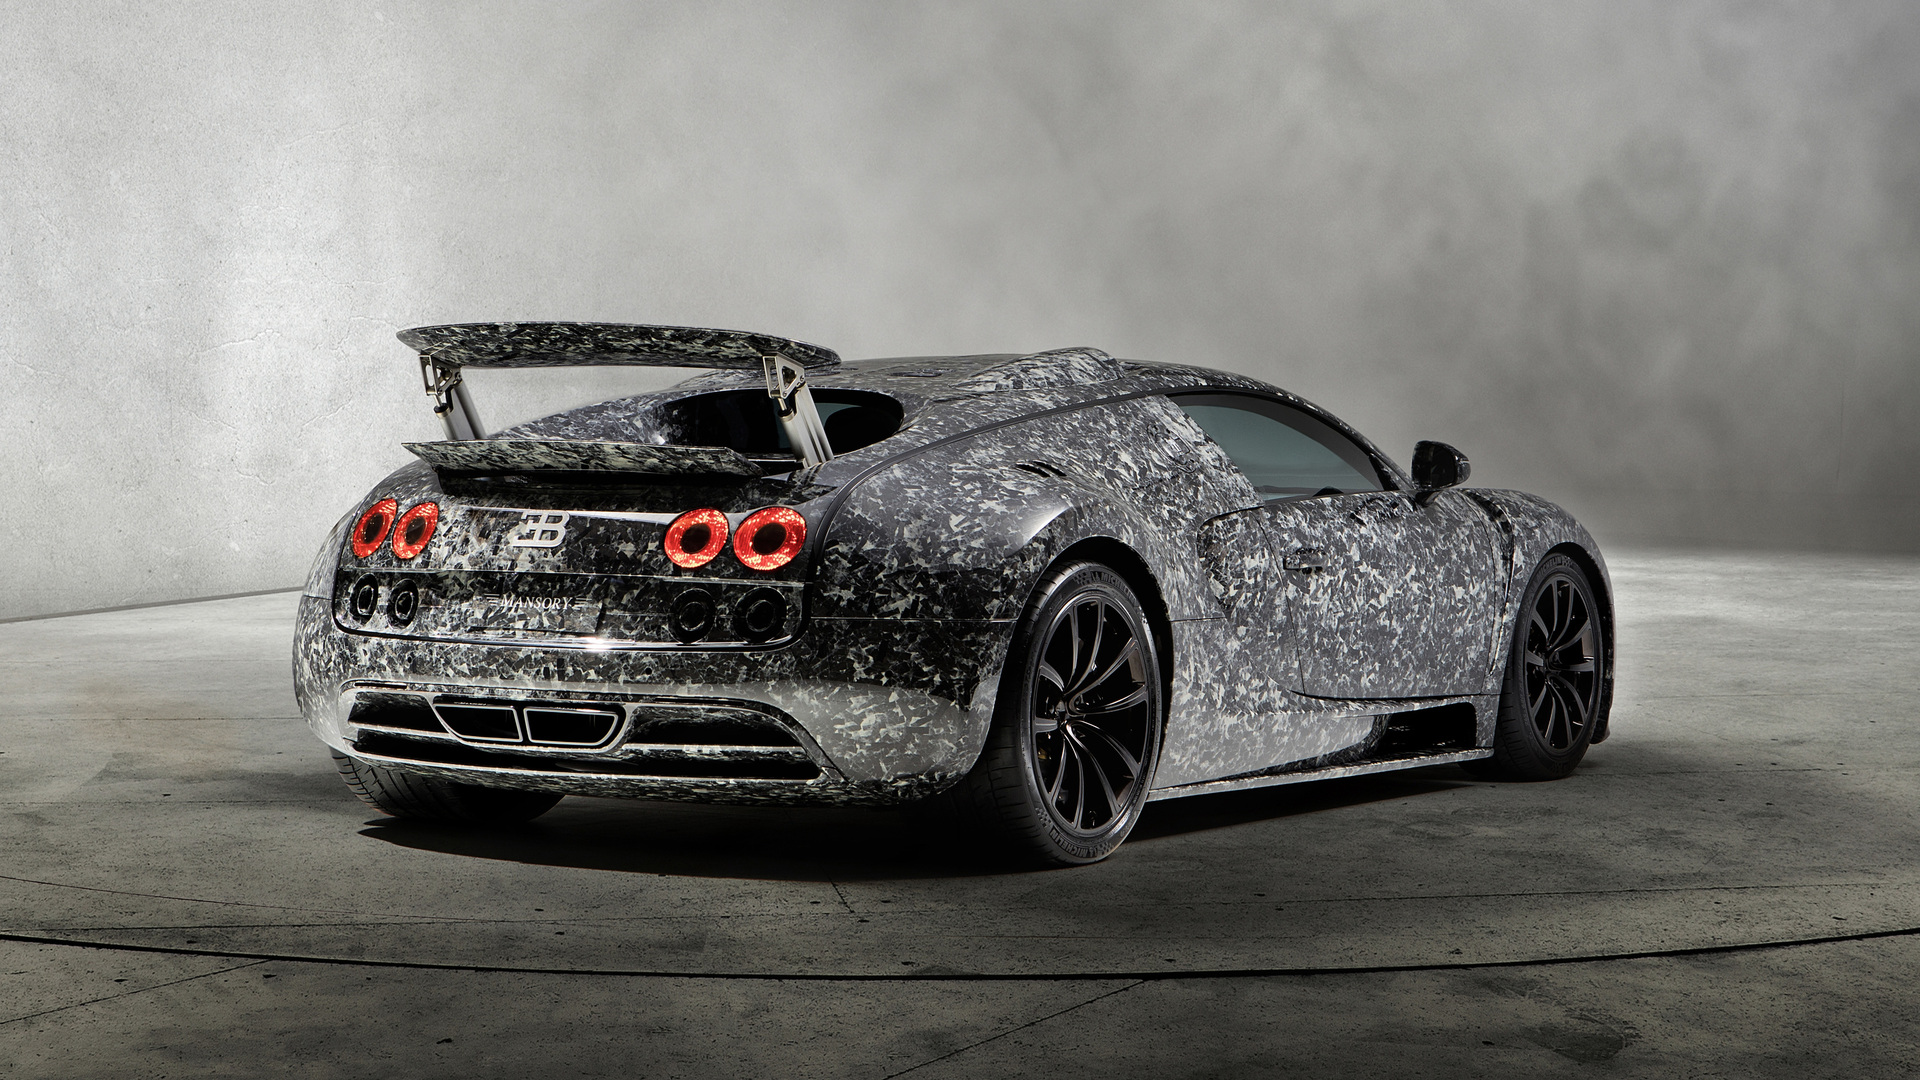 1920x1080 2018 Mansory Bugatti Veyron Vivere Diamond Edition